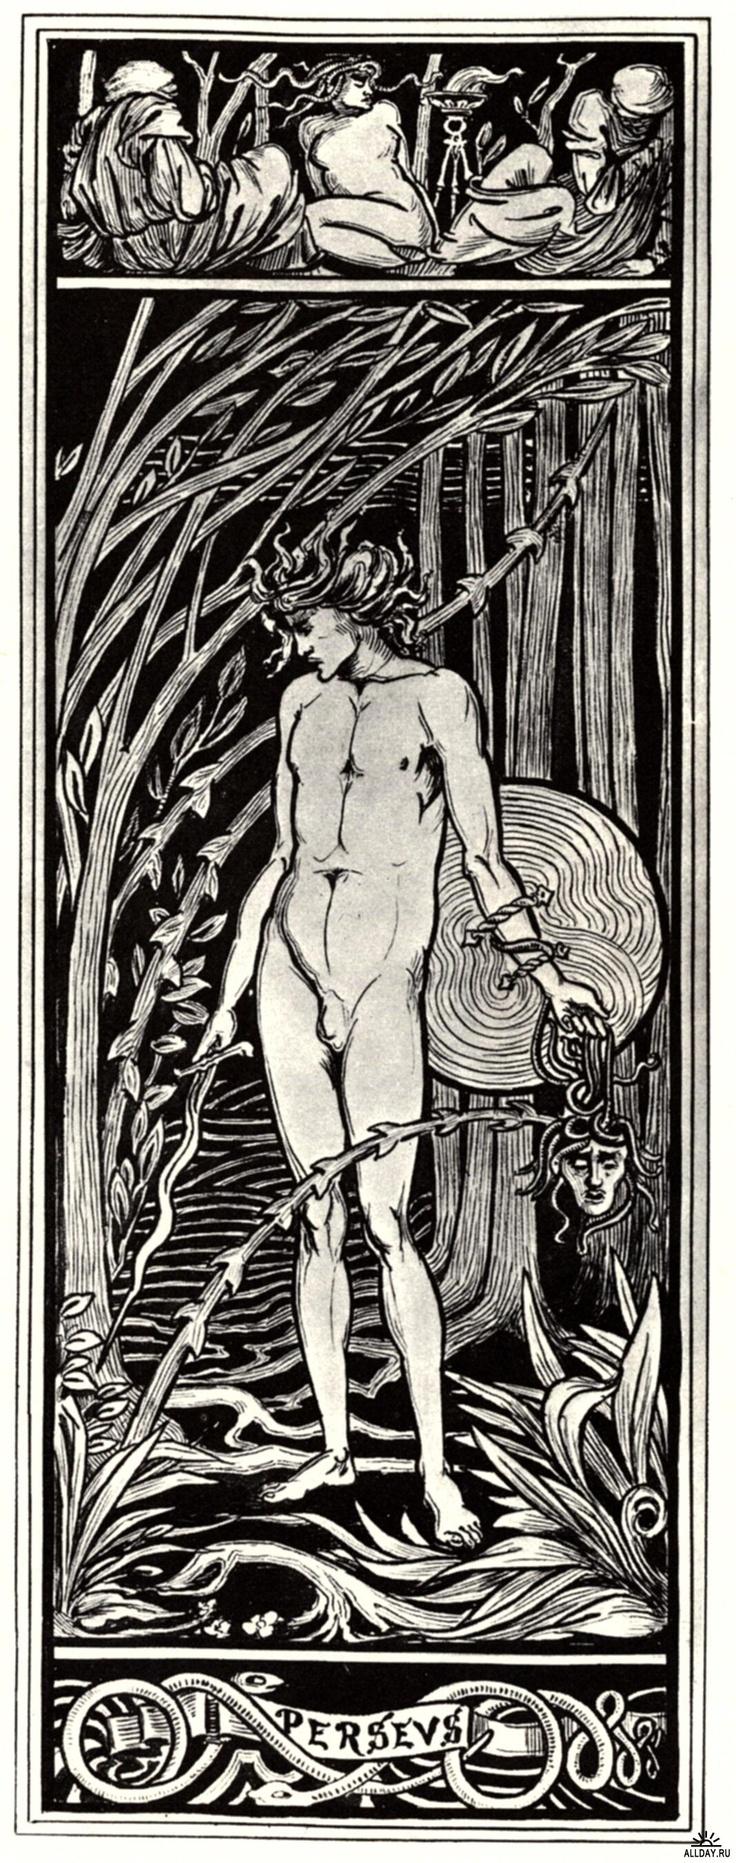 Sex and Sensibility: The Allure of Art Nouveau.  British artist  Aubrey Beardsley